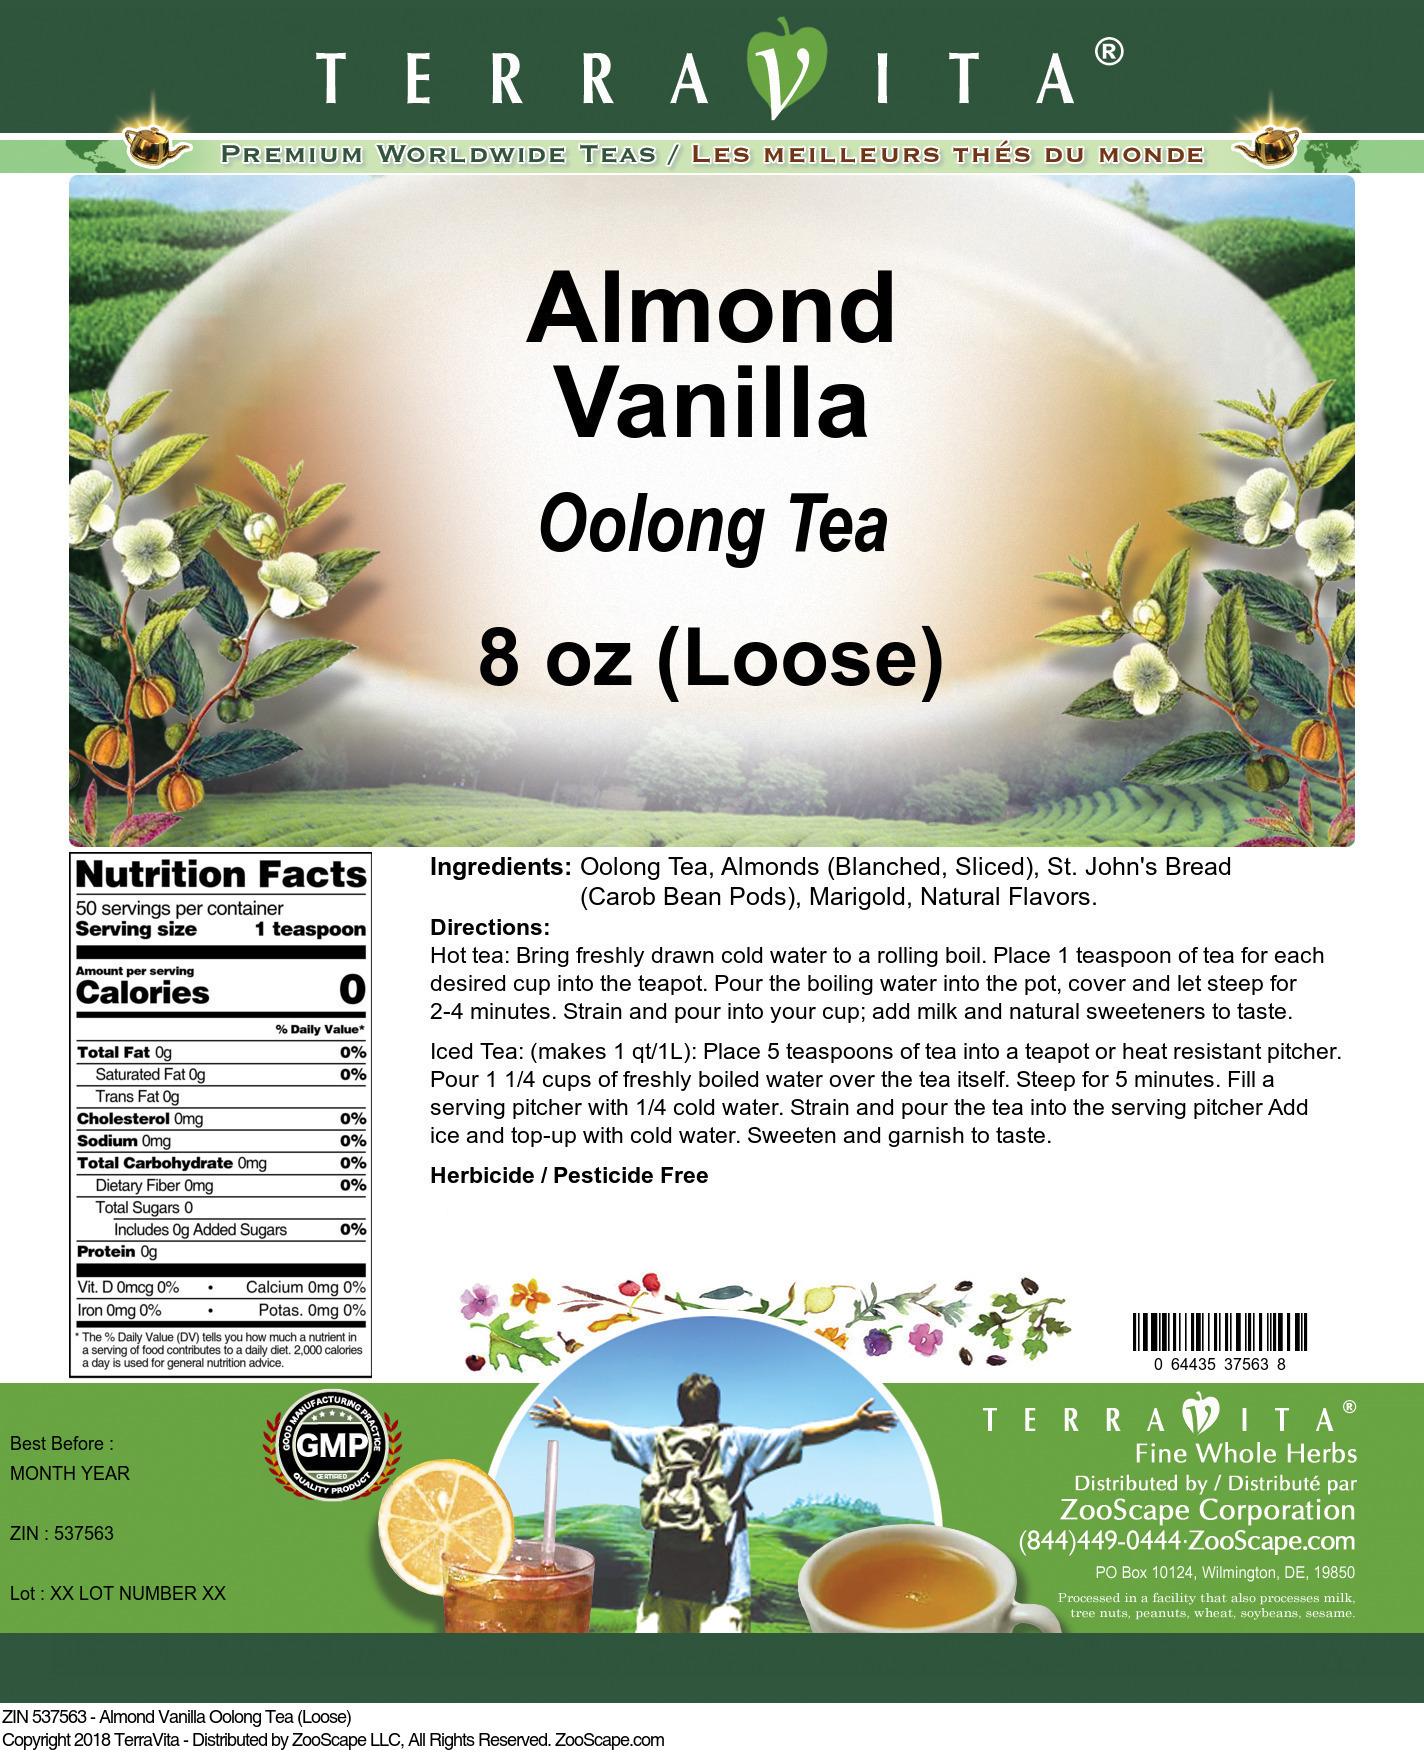 Almond Vanilla Oolong Tea (Loose)